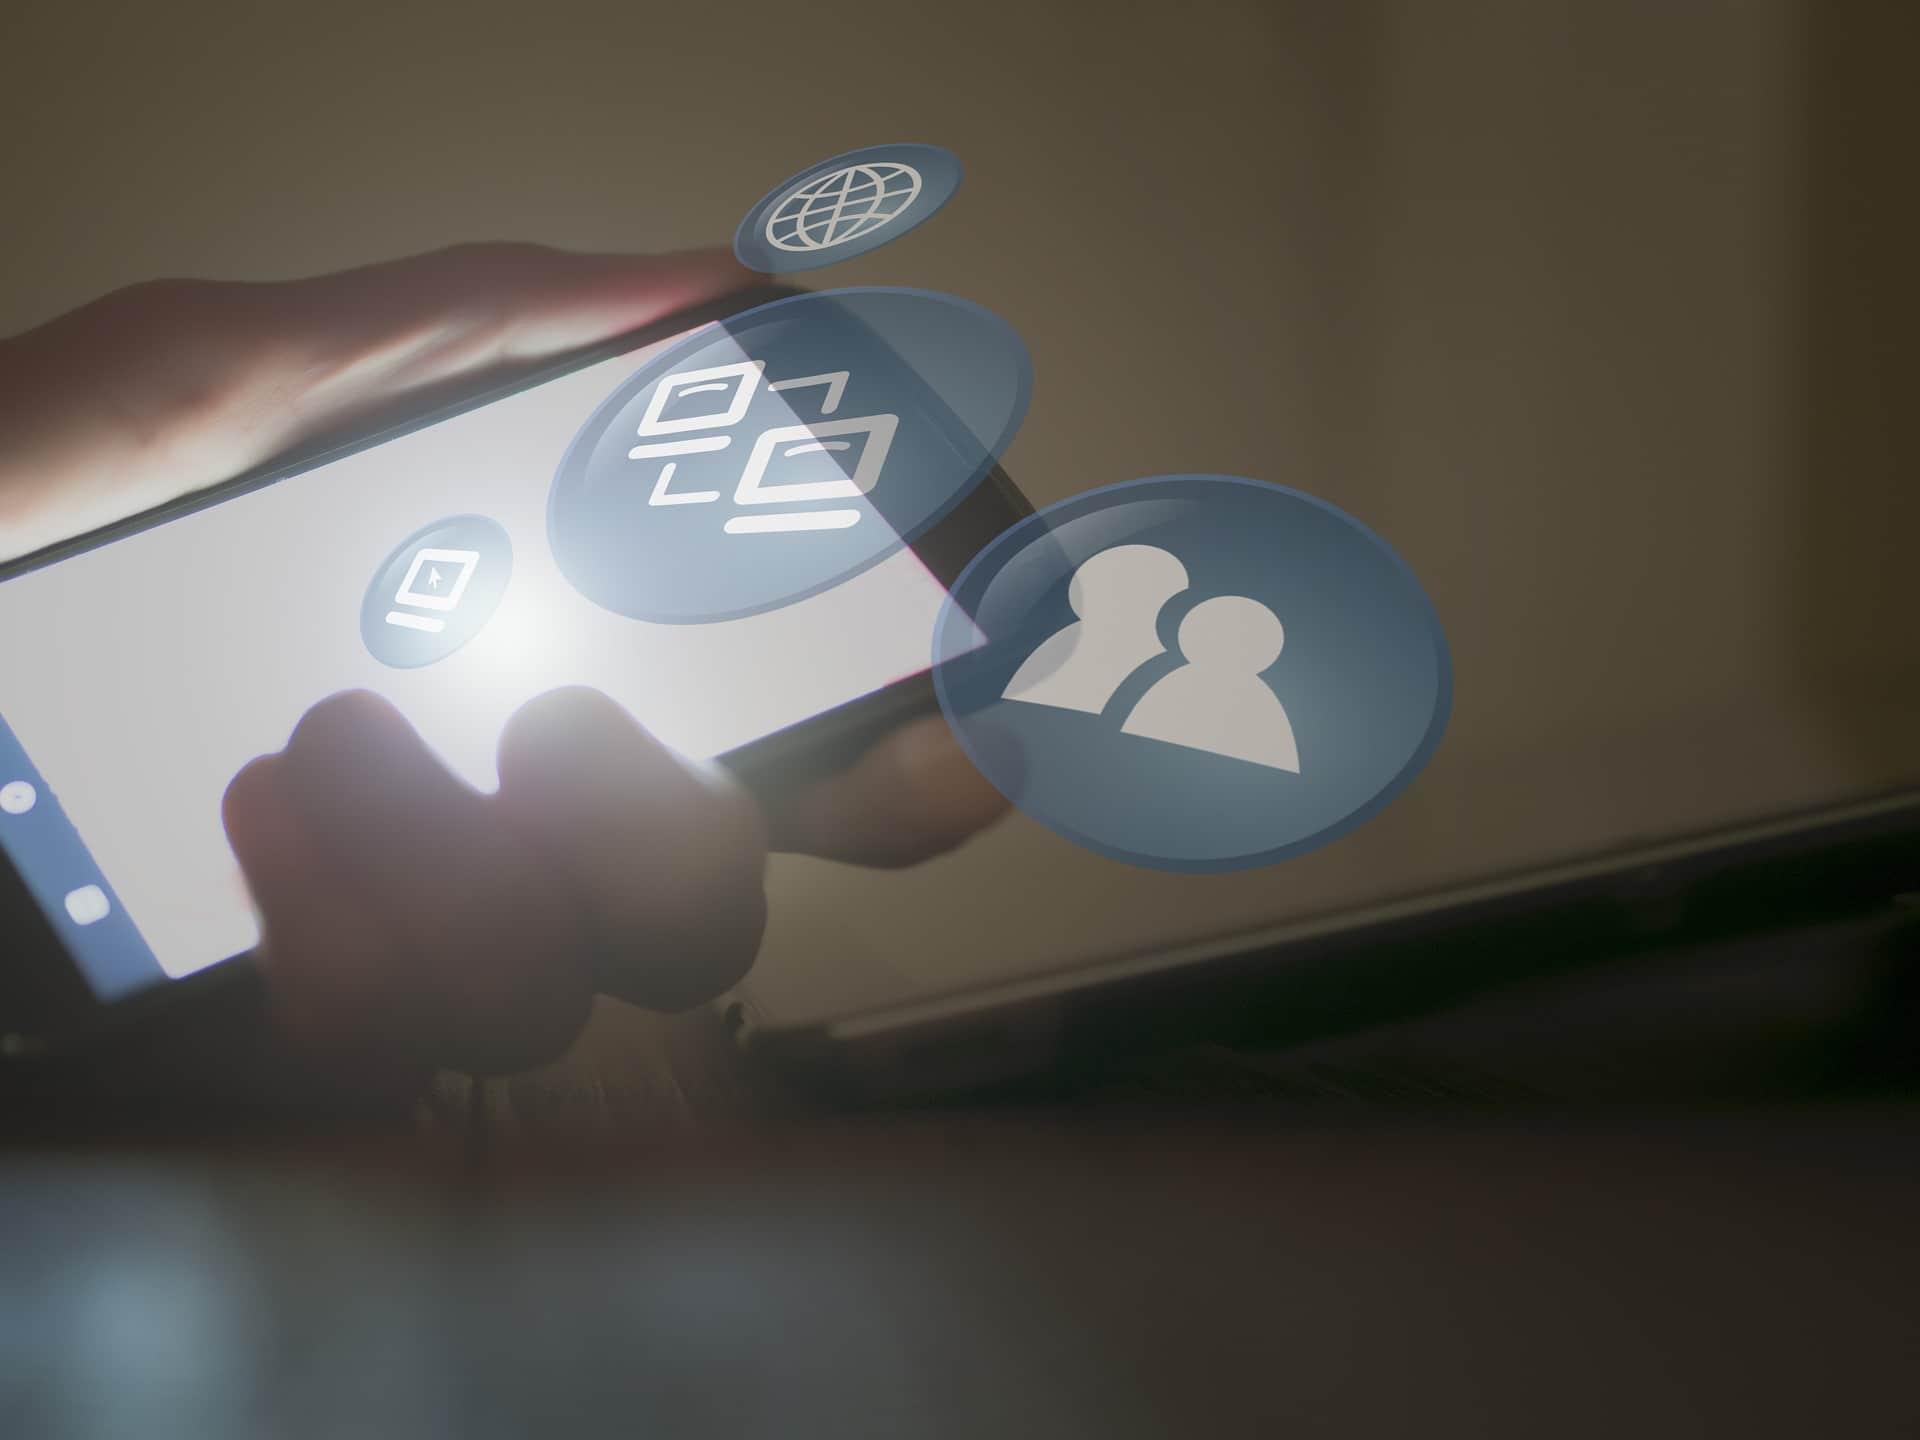 telefon app som kan tolkes piratkopiert